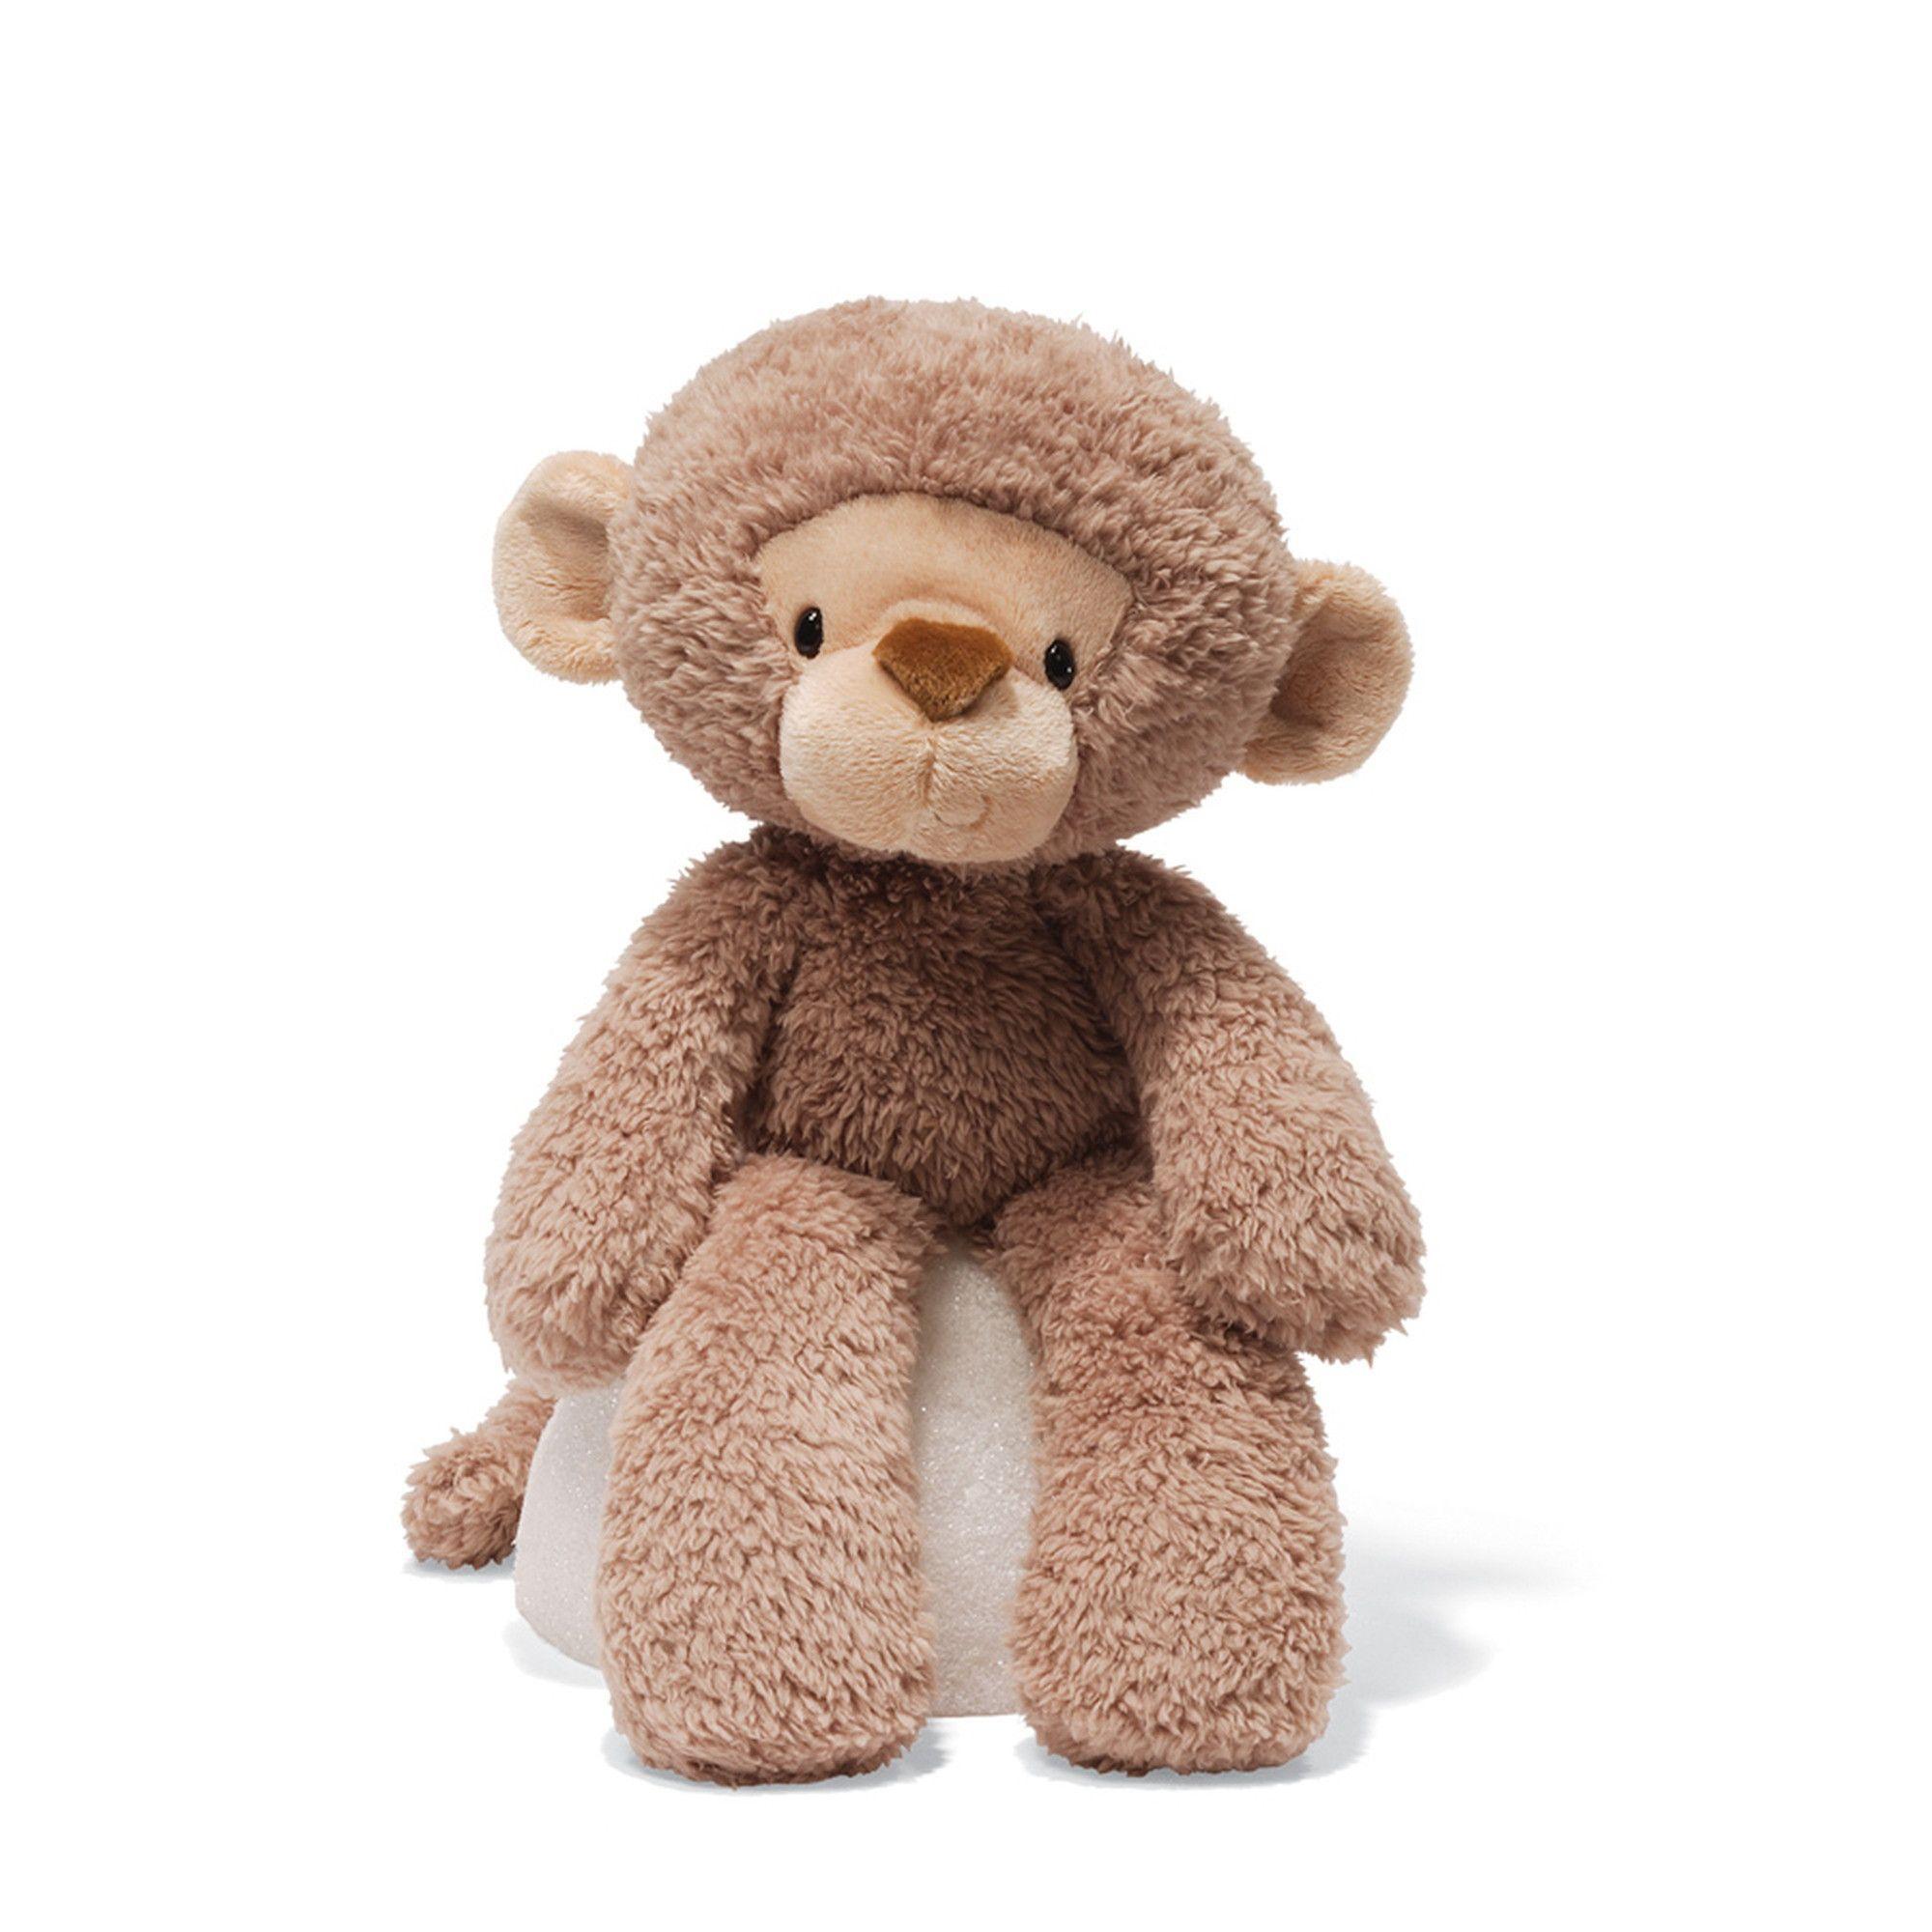 Fuzzy Plush Toys Monkey stuffed animal, Monkey plush toy